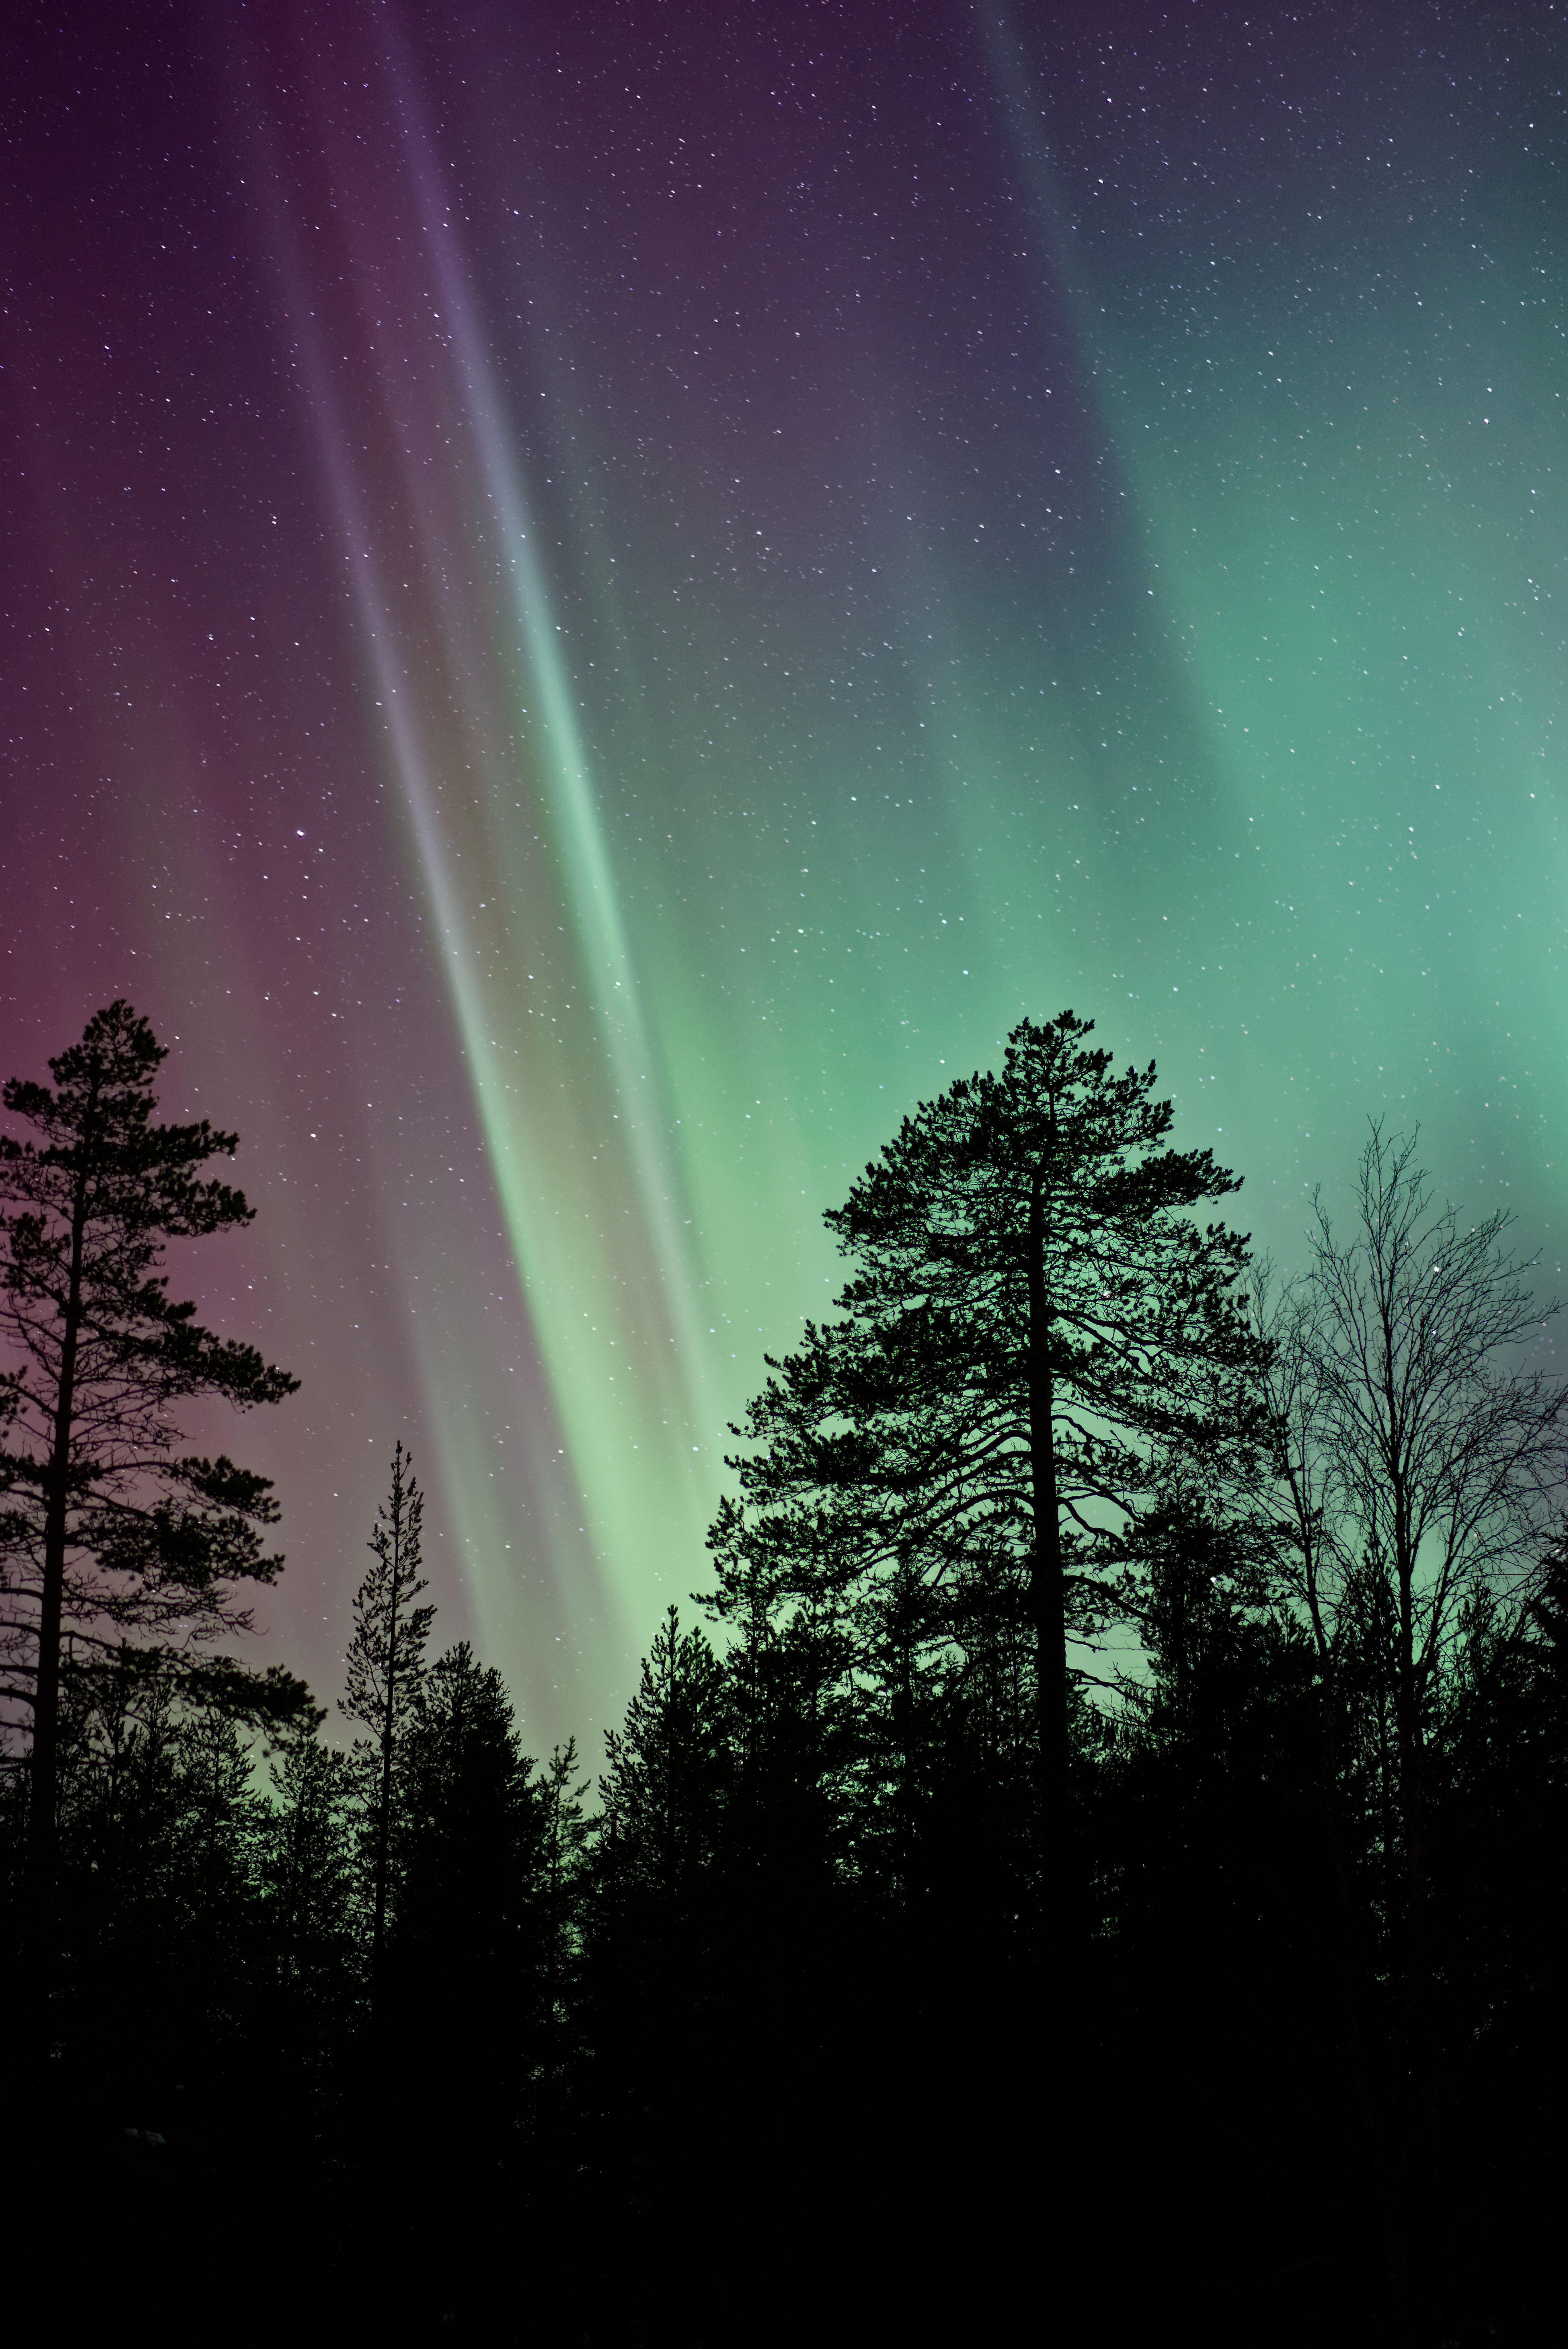 Flott Tree, silhouette, northern light and aurora borealis HD photo by UA-65